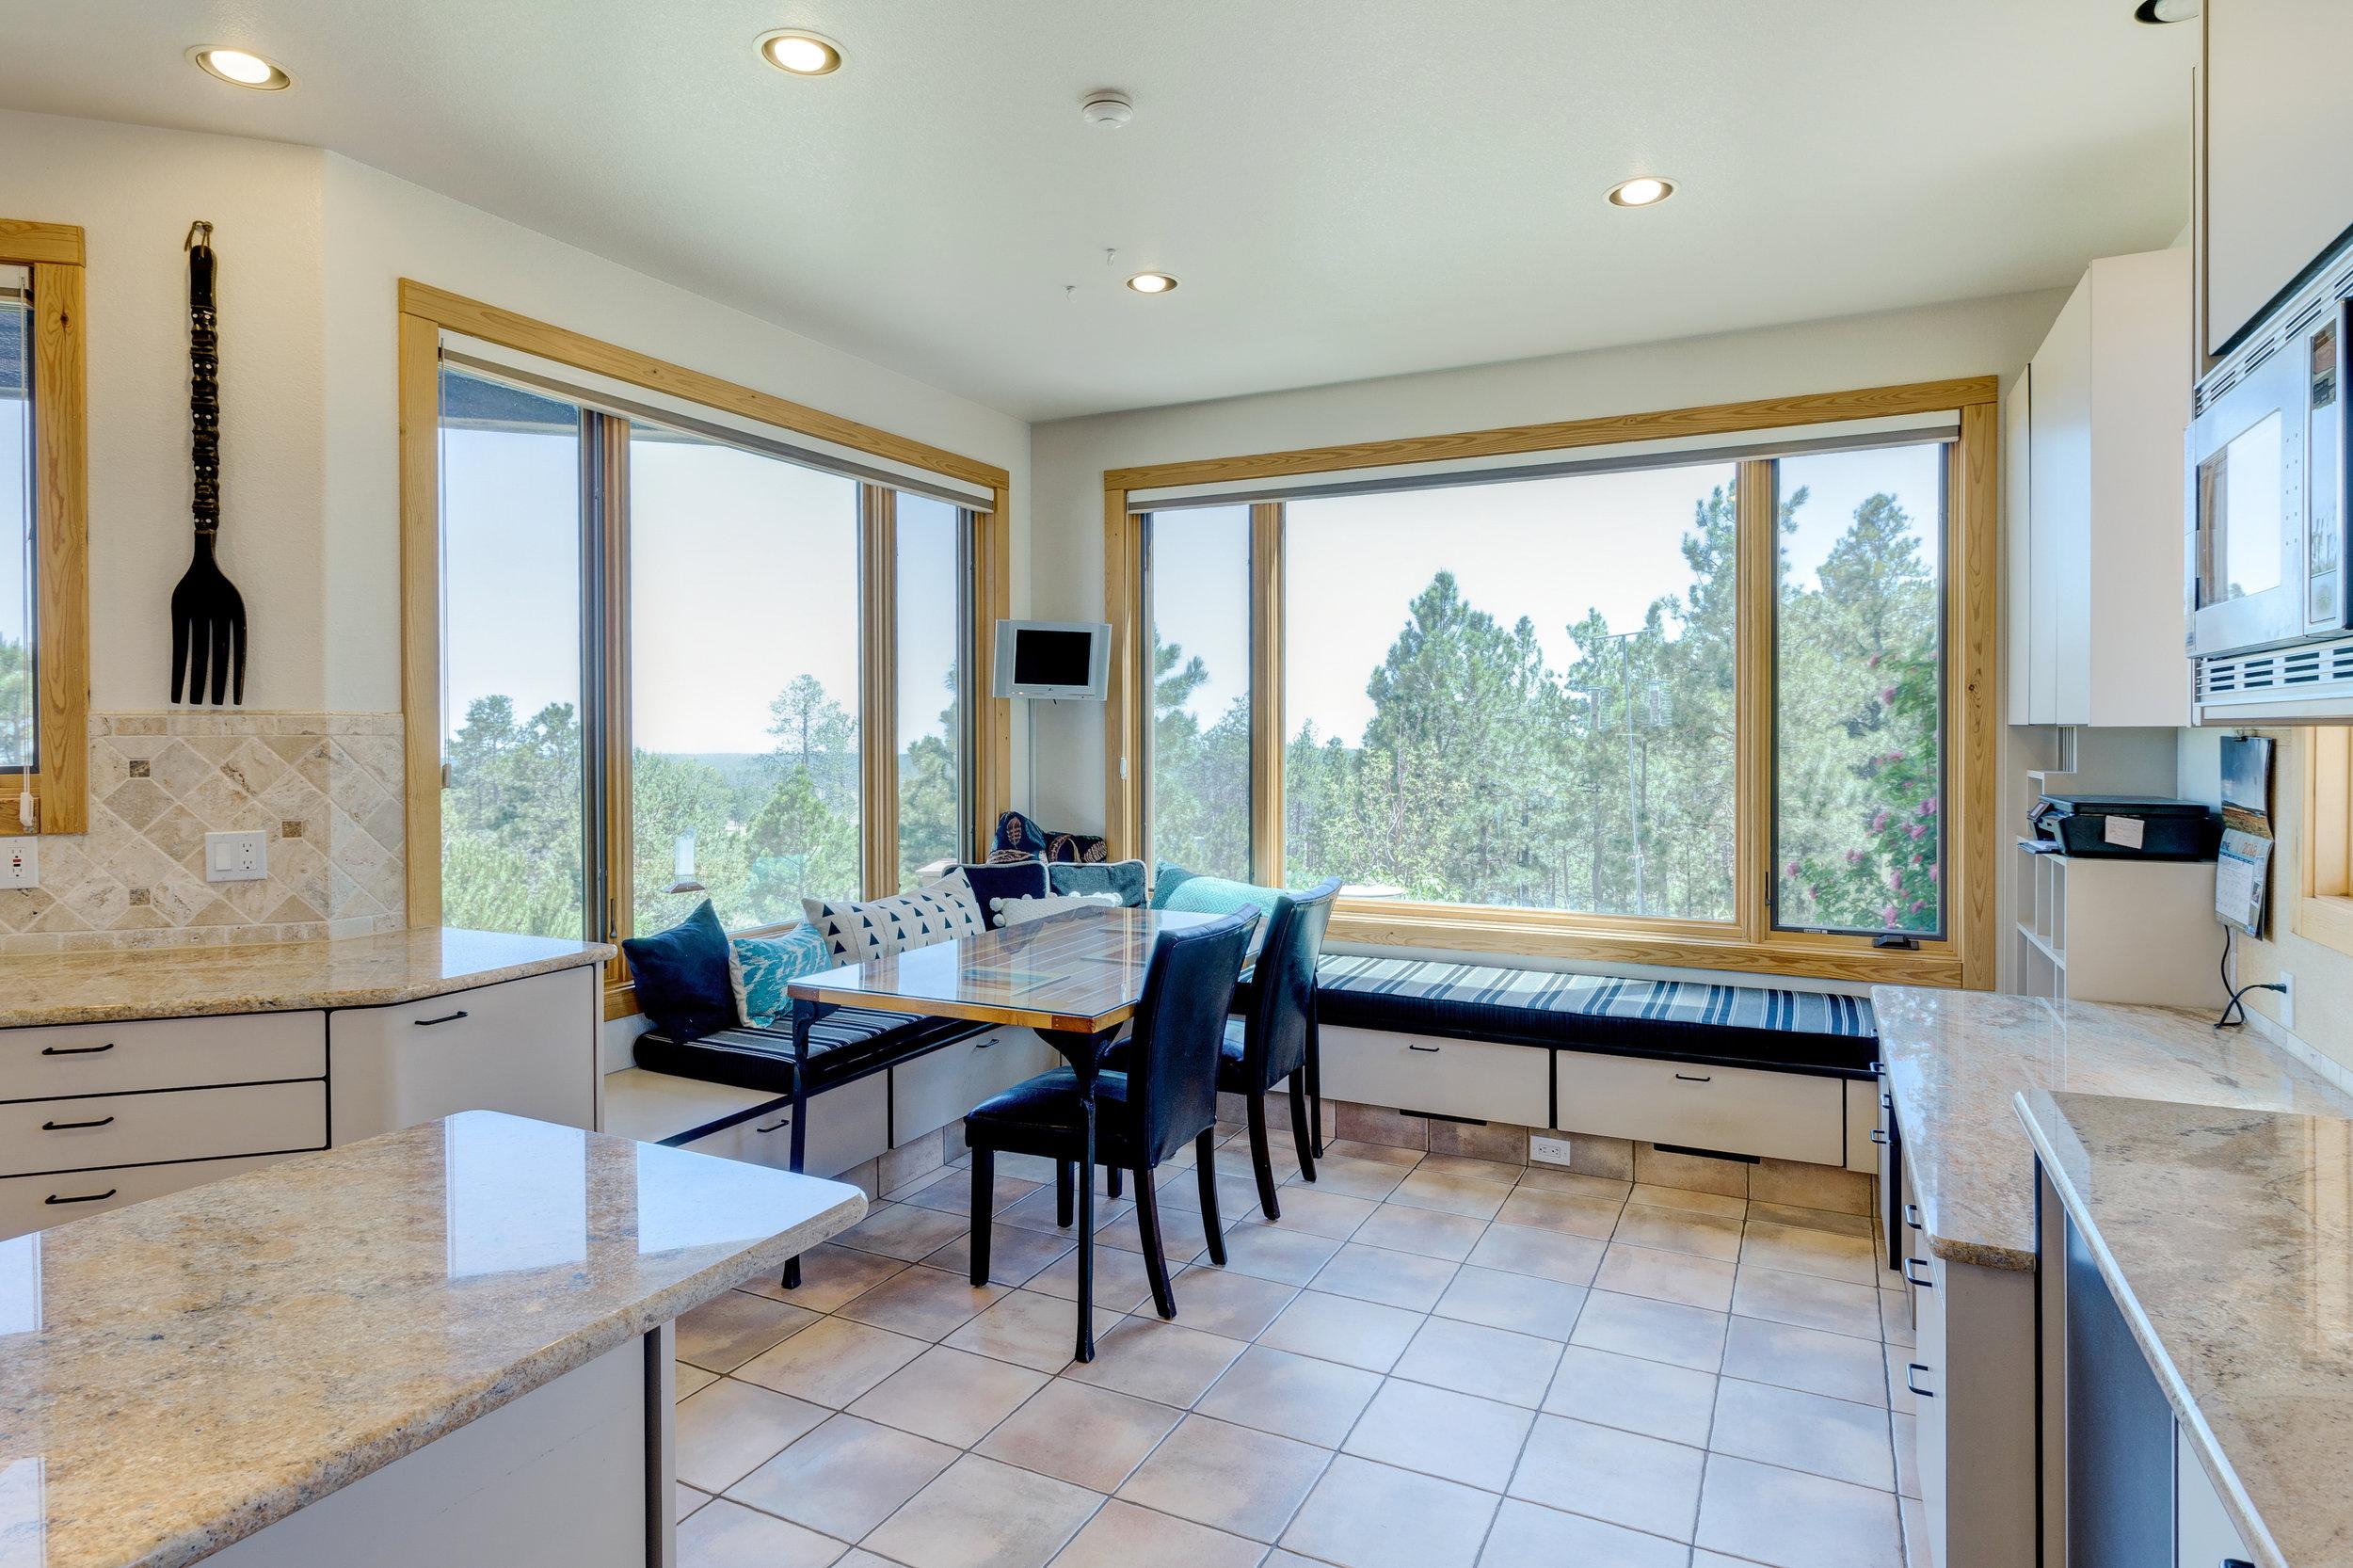 14-Kitchen Sitting Area.jpg